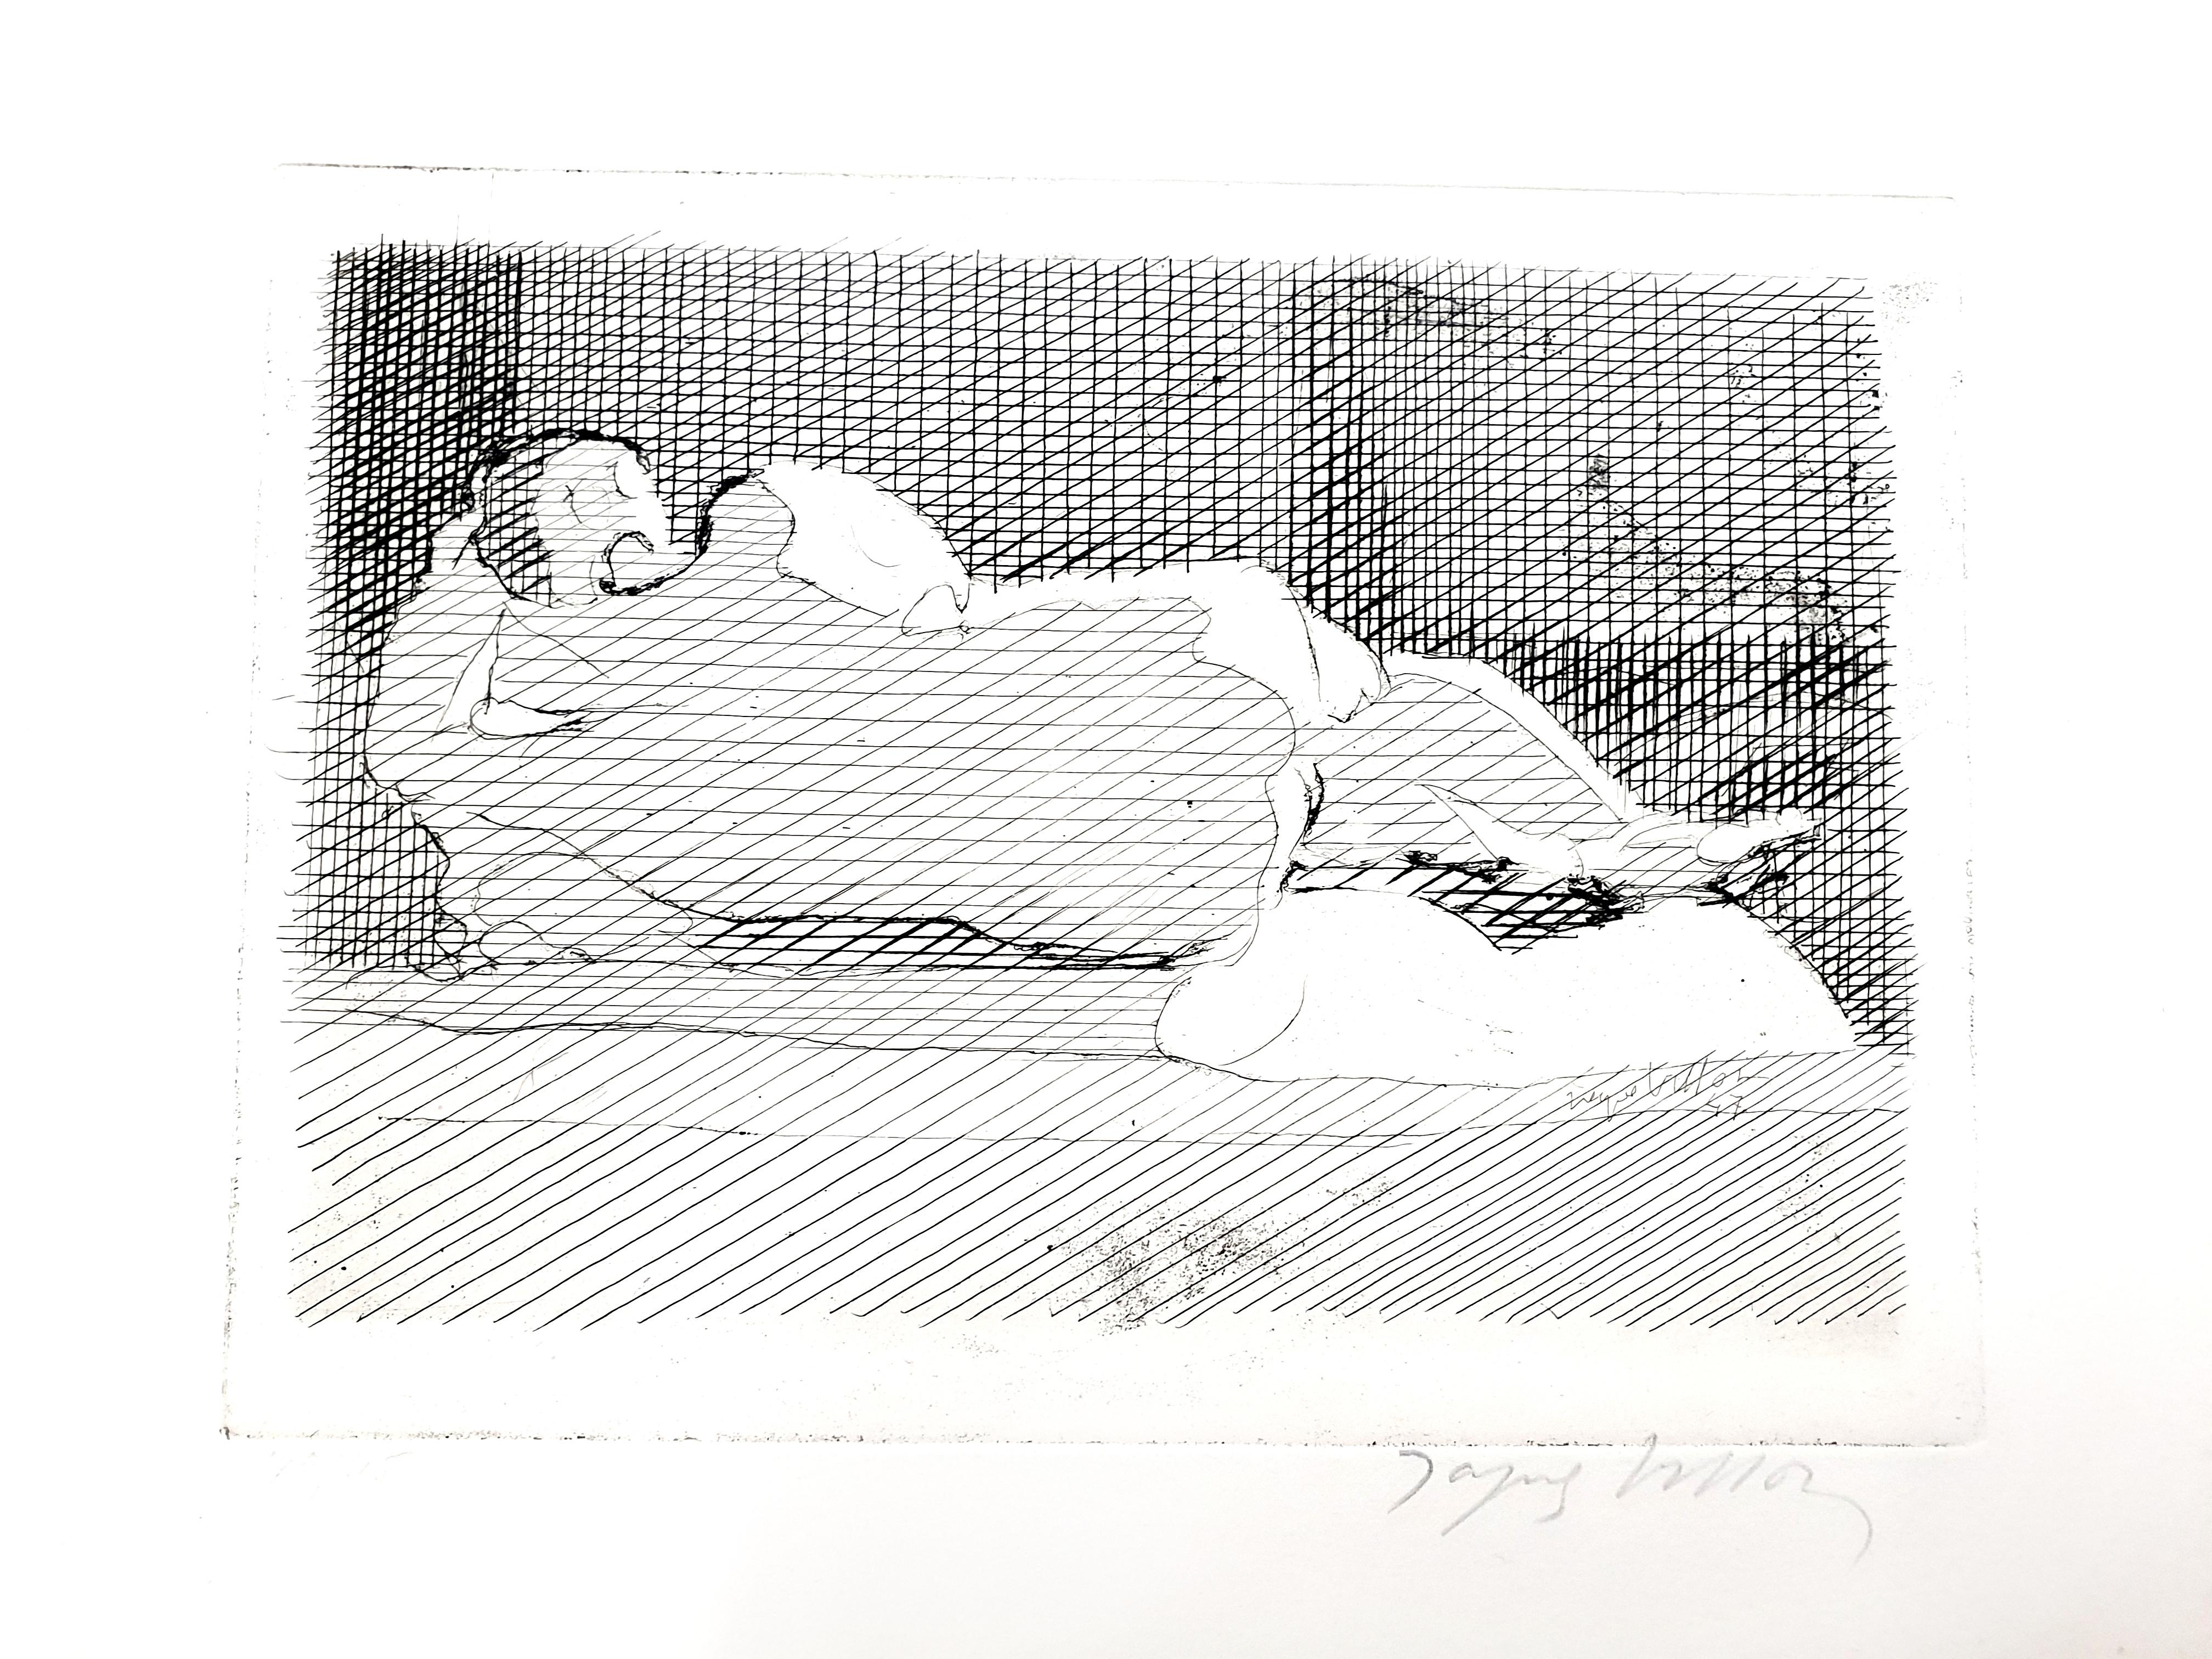 Jacques Villon - Sleeping Nude - Original Etching